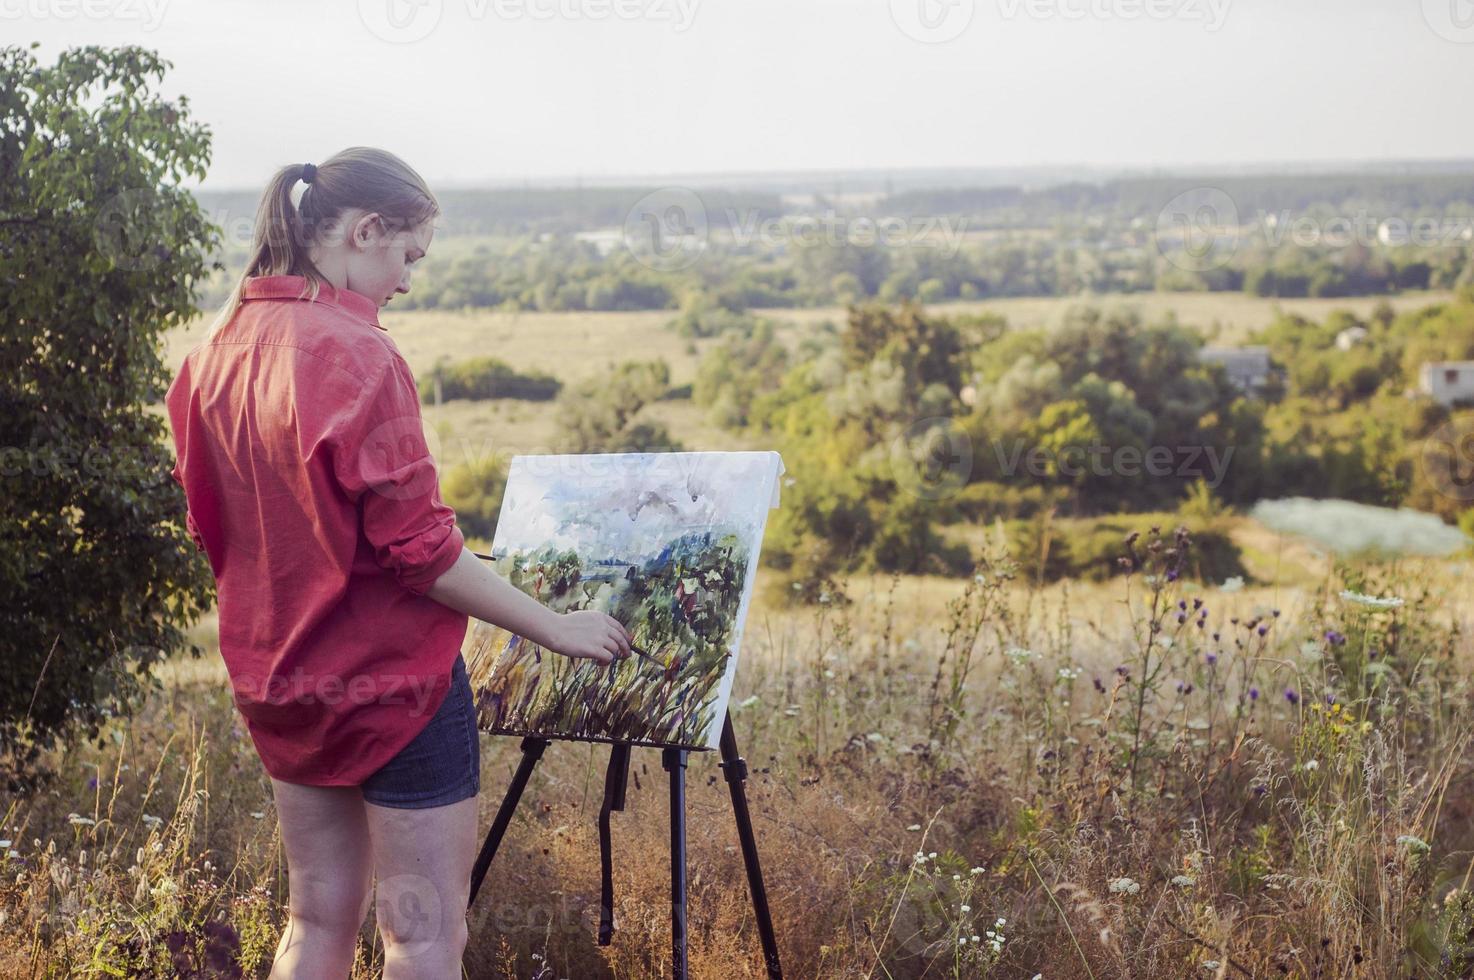 Artist on the plain air photo